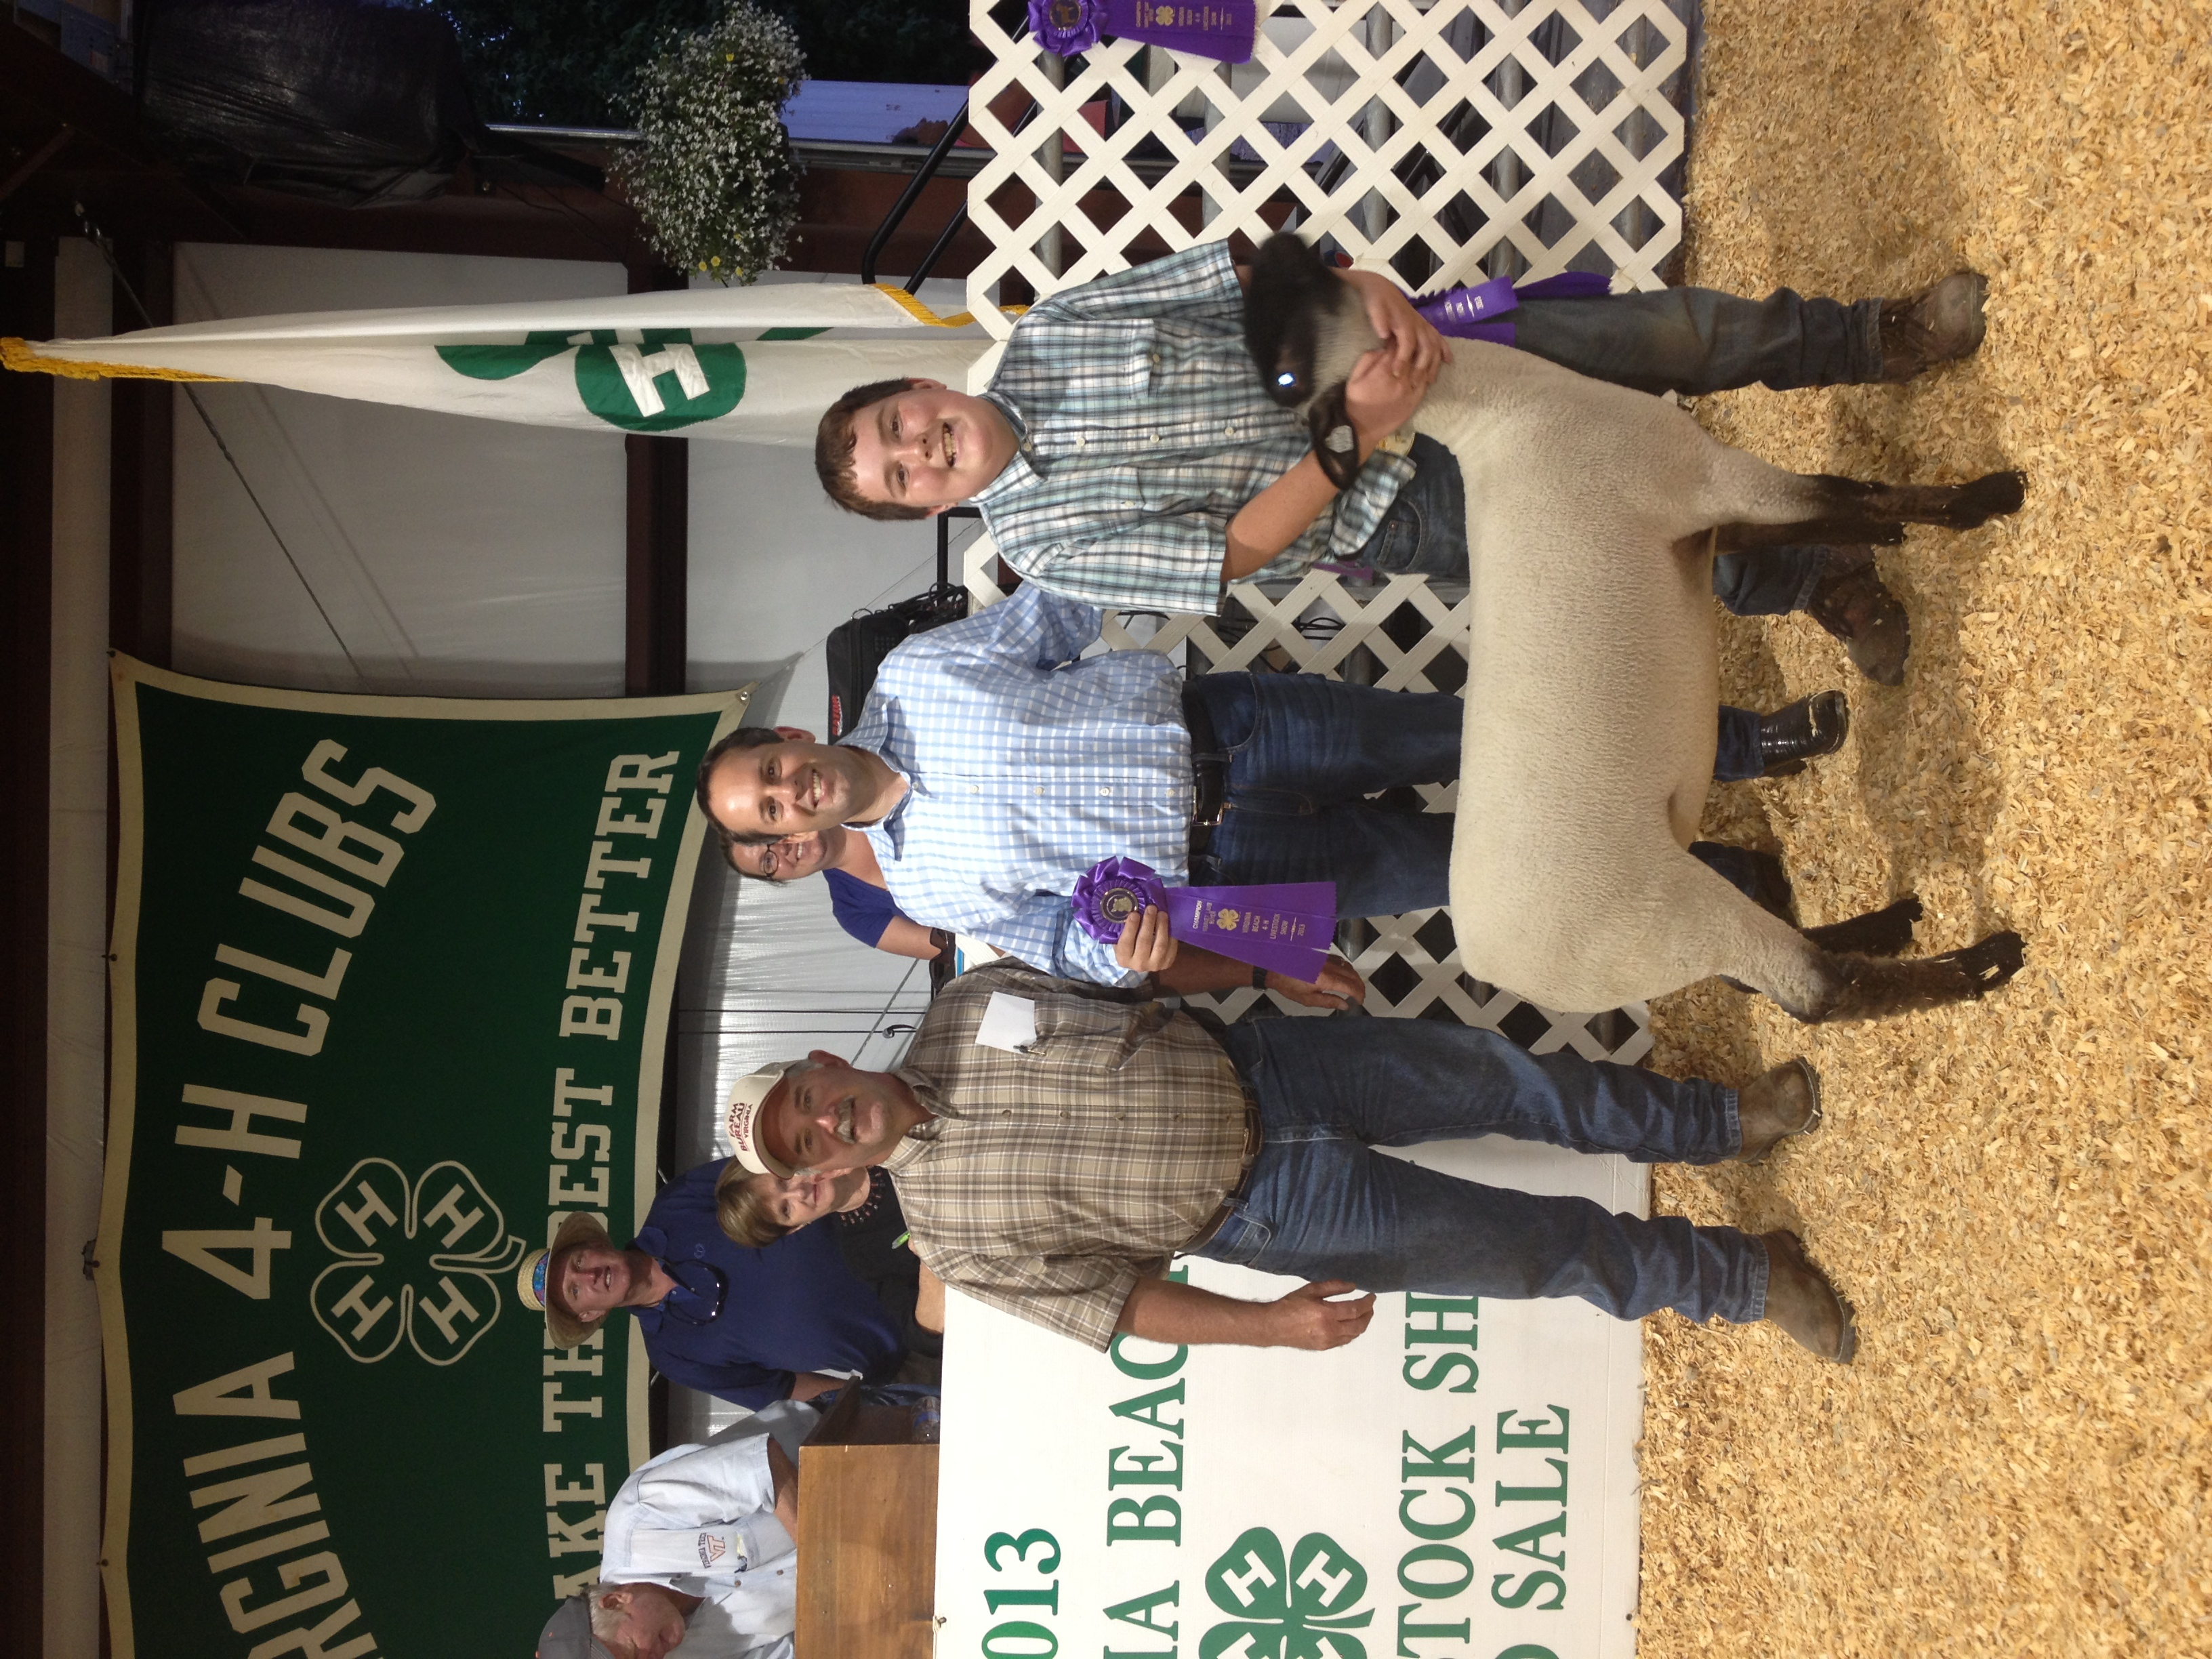 2013 4-H Livestock Show, Grand Champion Lamb